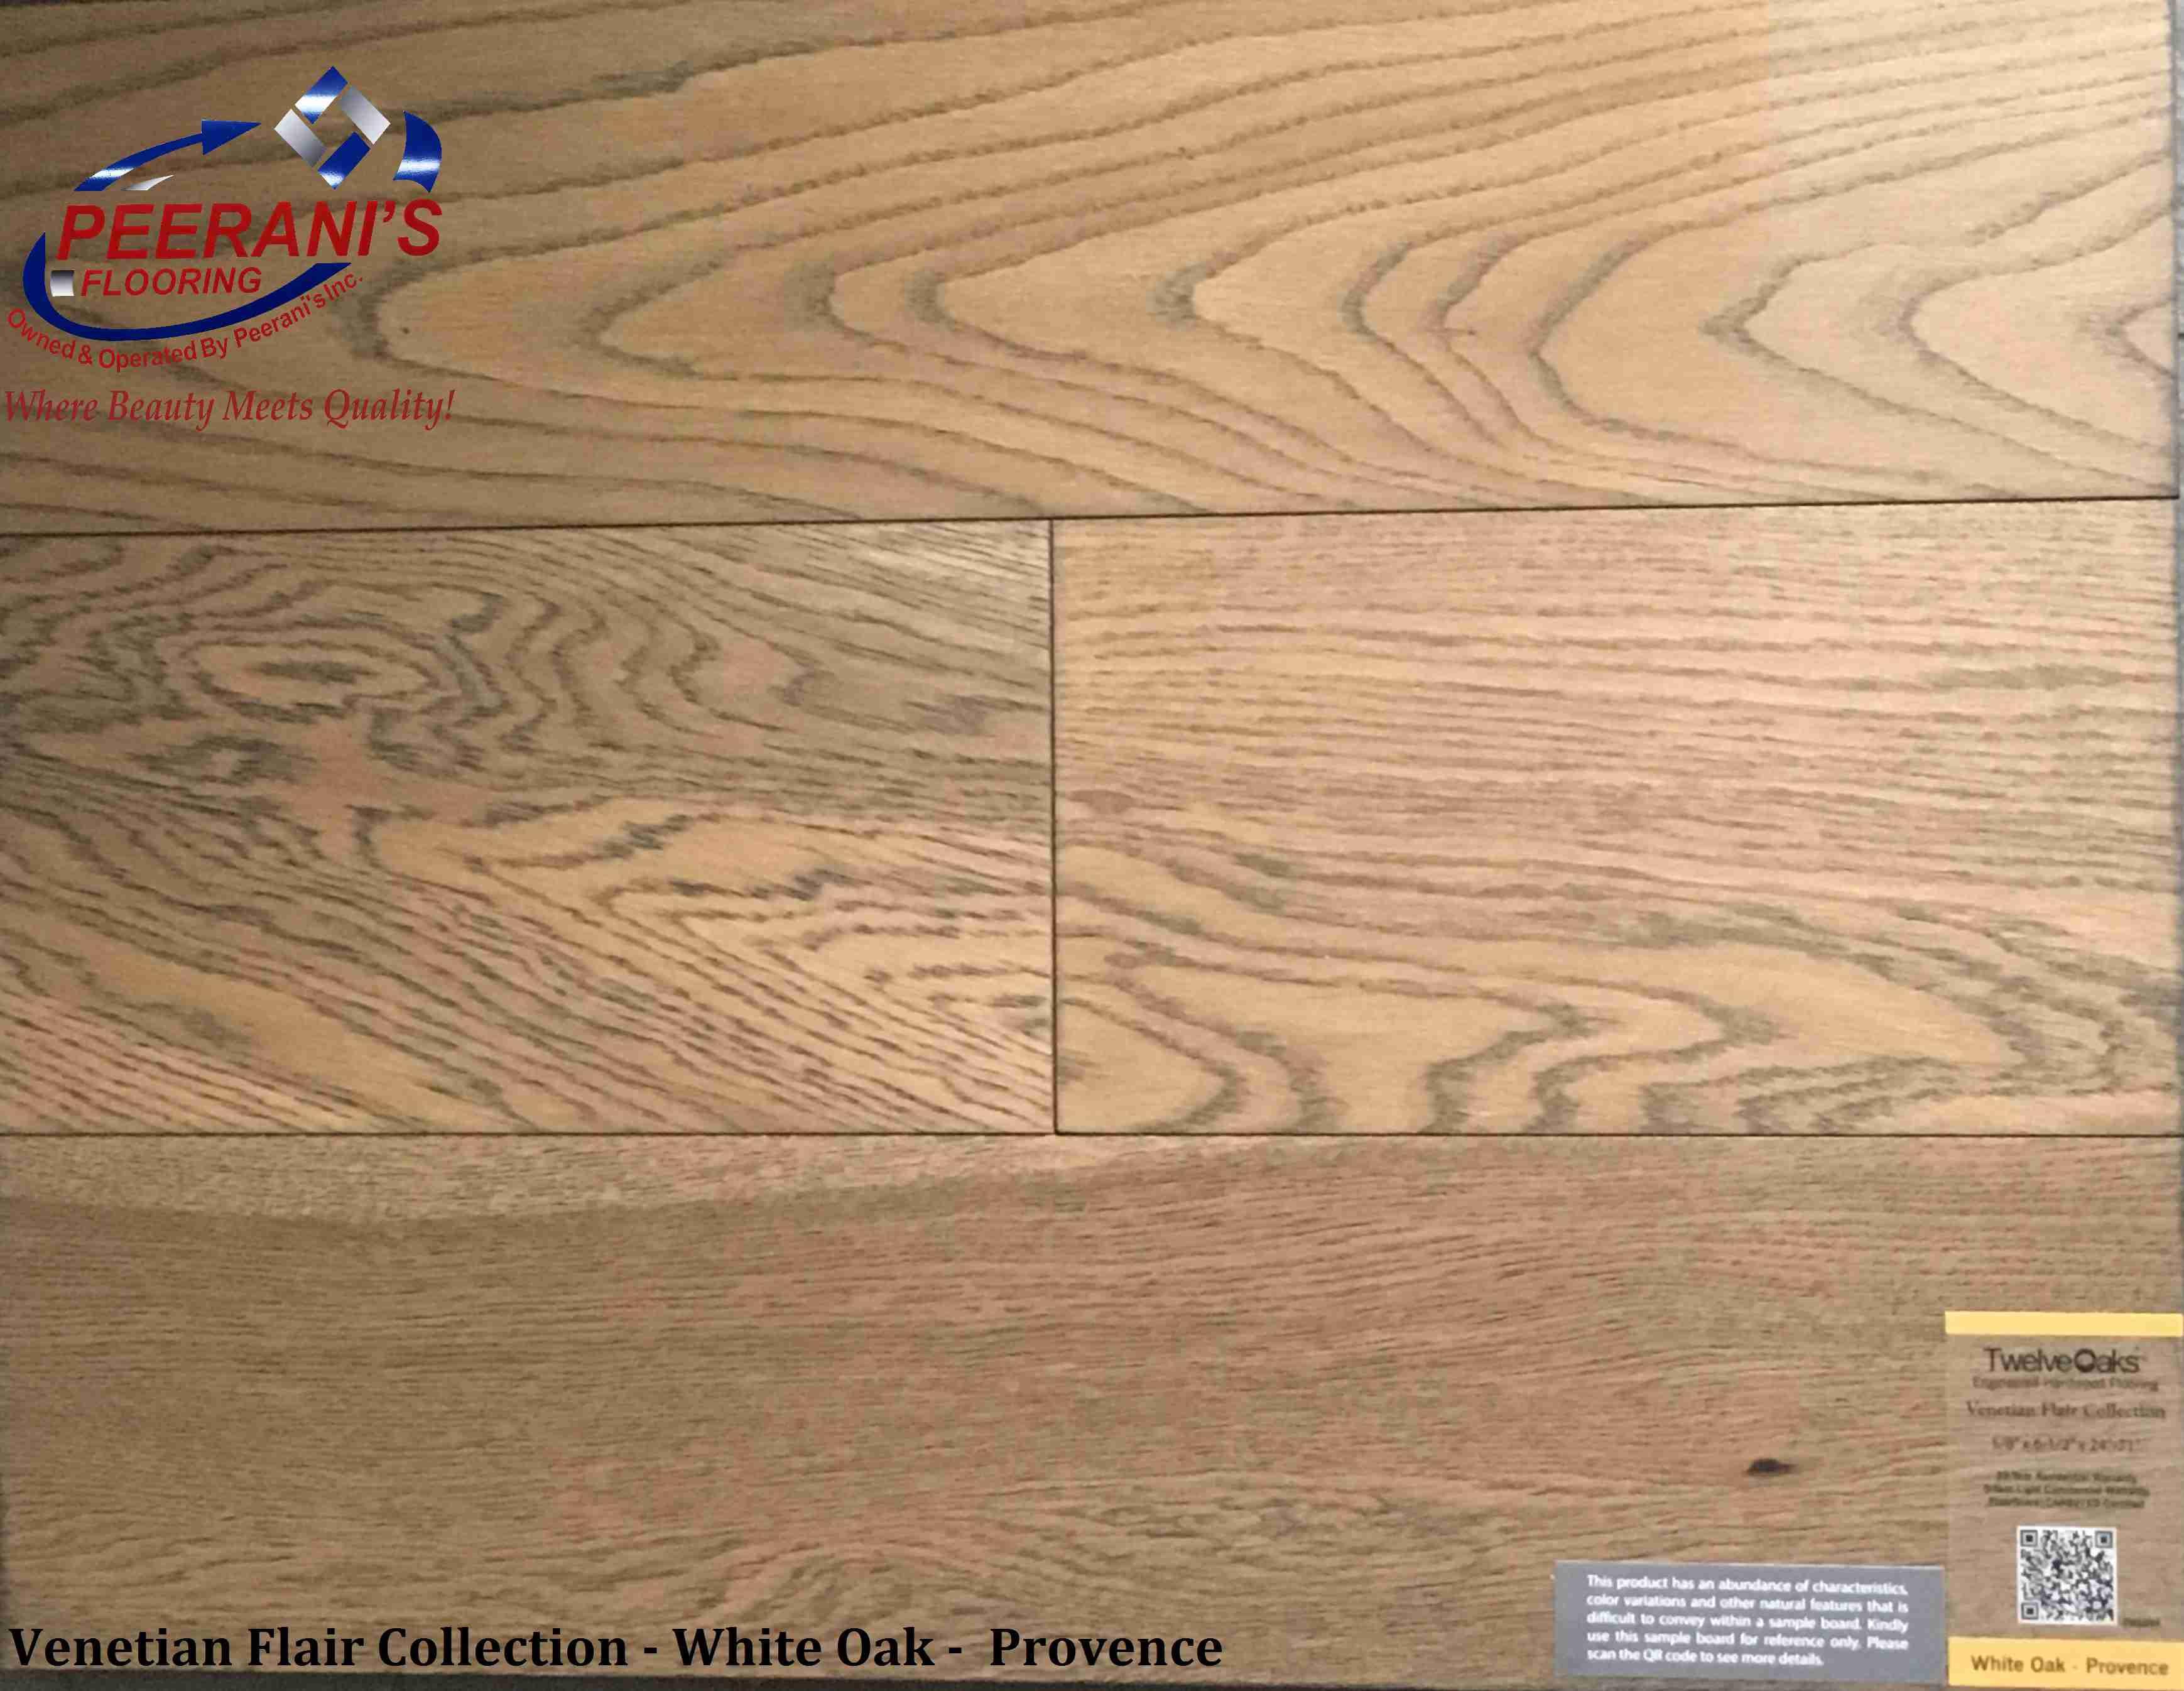 pictures of white oak hardwood floors of twelve oaks archives page 3 of 4 peeranis inside venetian flair white oak provence